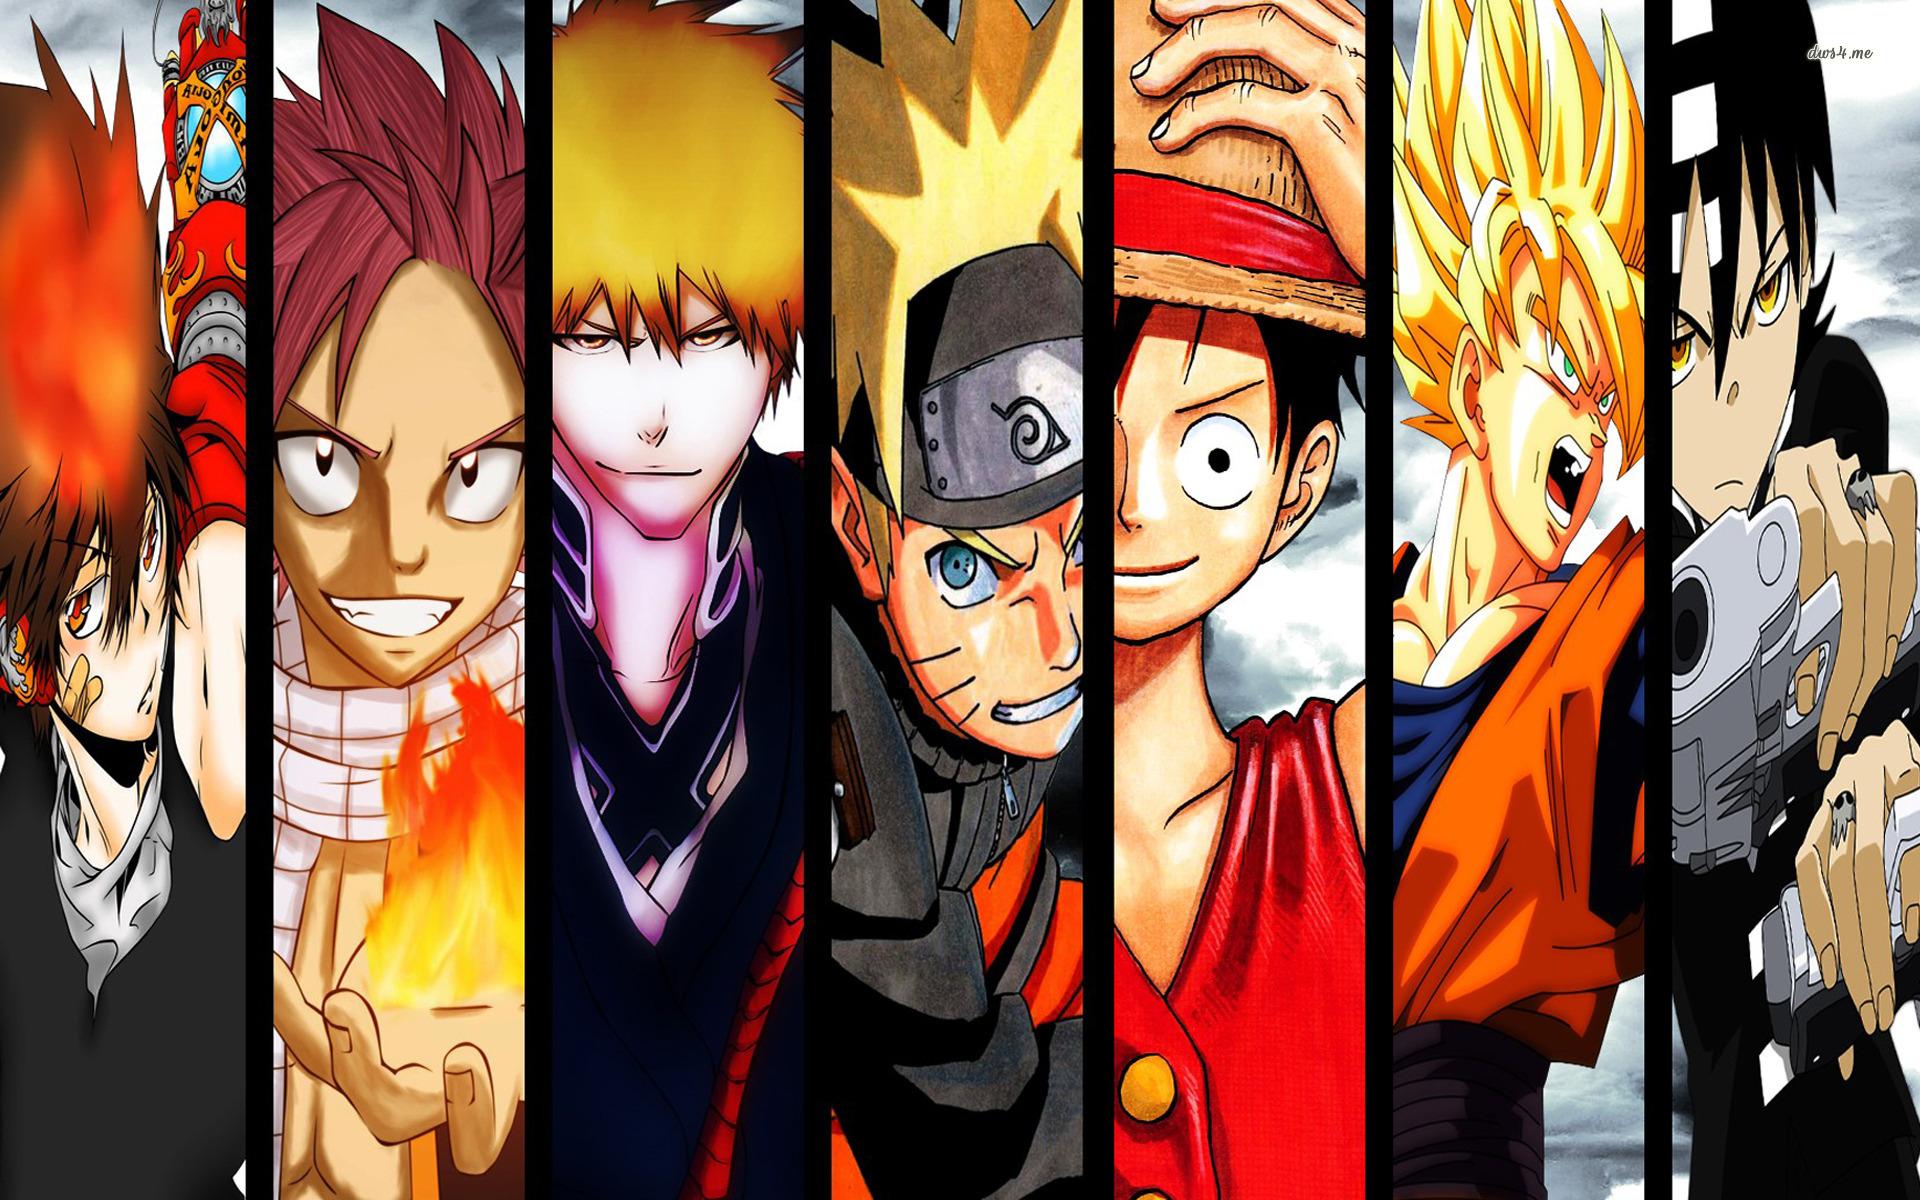 Beautiful Wallpaper Naruto Dbz - 3653-anime-medley-1920x1200-anime-wallpaper  Snapshot_784129.jpg